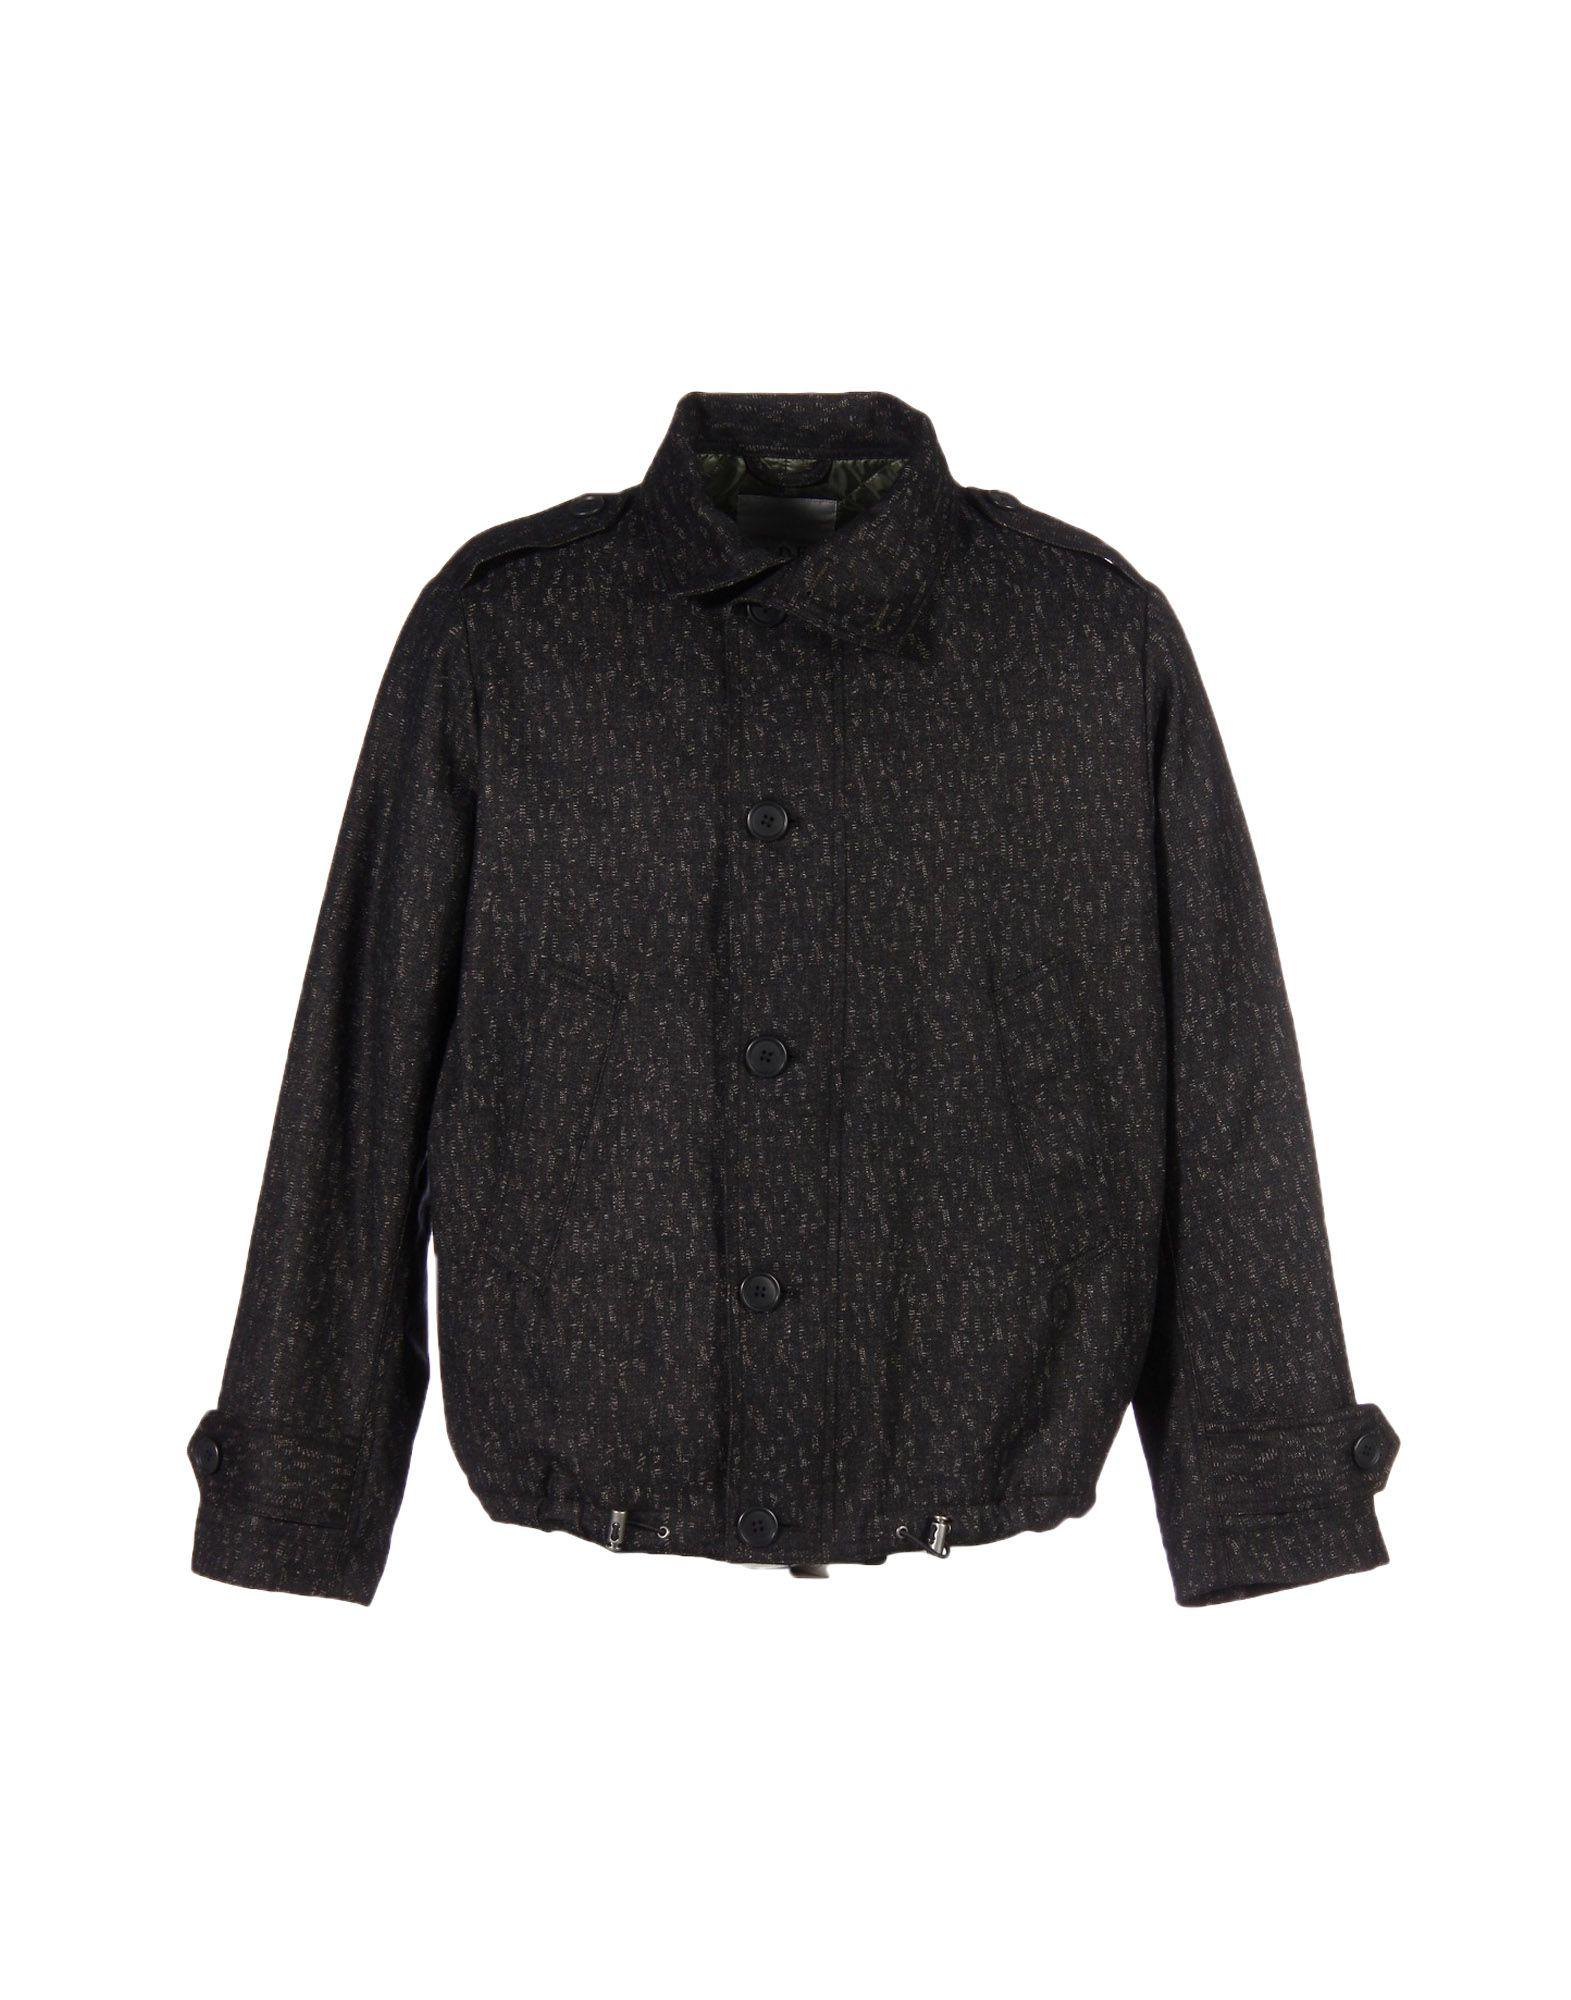 CADET Jackets in Steel Grey